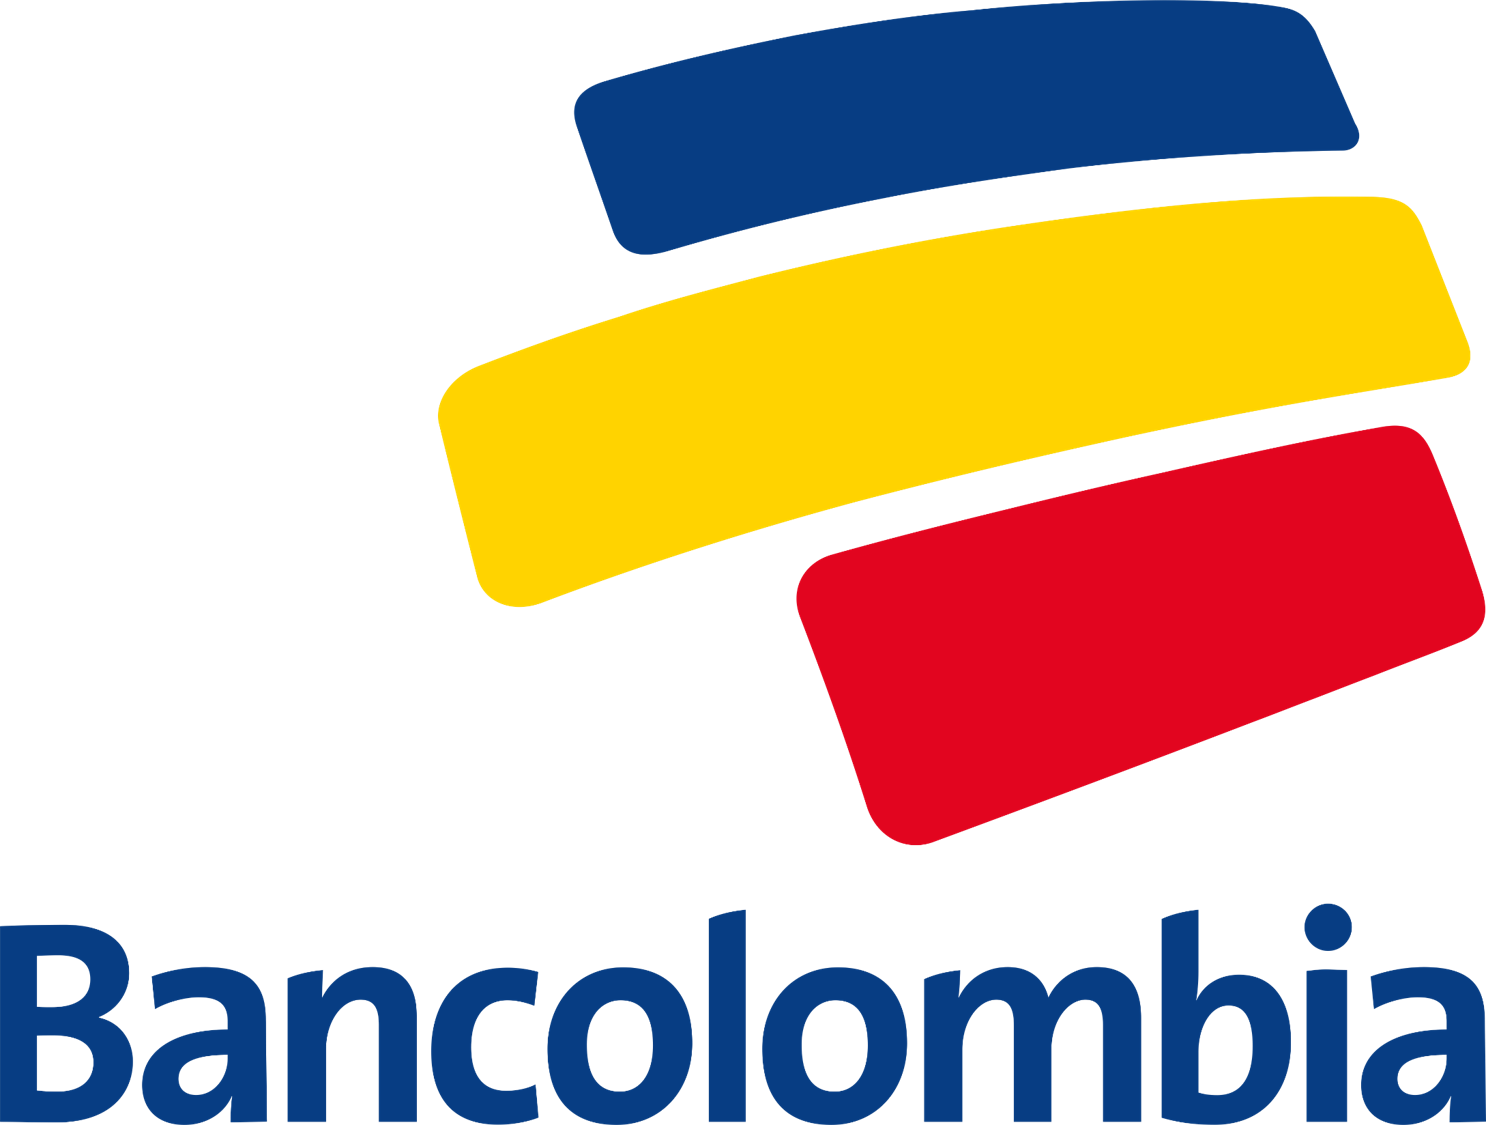 Image Bancolombia Logo 2006 Vertical Png Logopedia Fandom